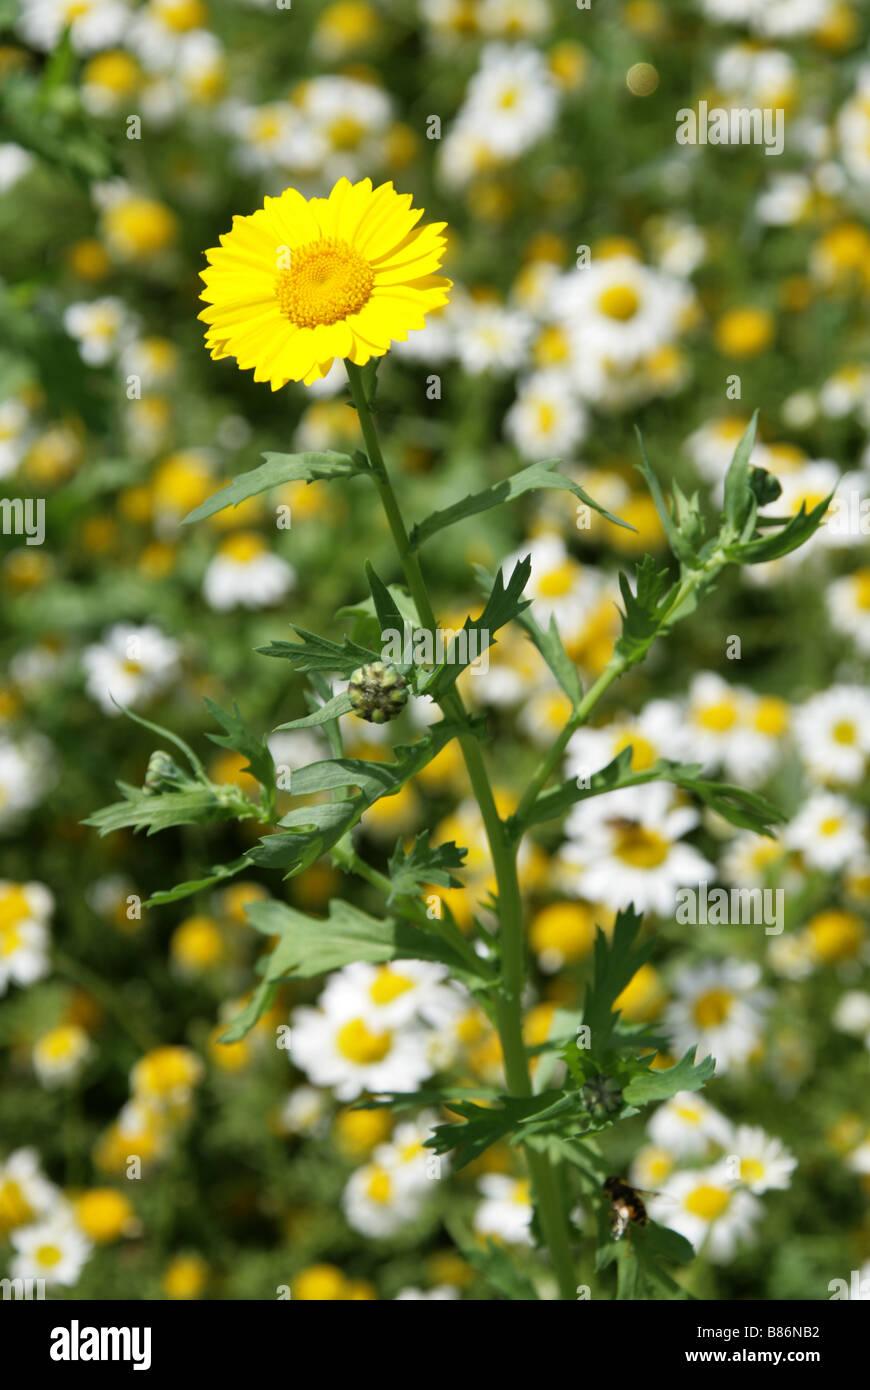 Caléndula, Chrysanthemum segetum maíz, Asteraceae y margaritas de Ojo de Buey Chryanthemum leucanthemum Foto de stock